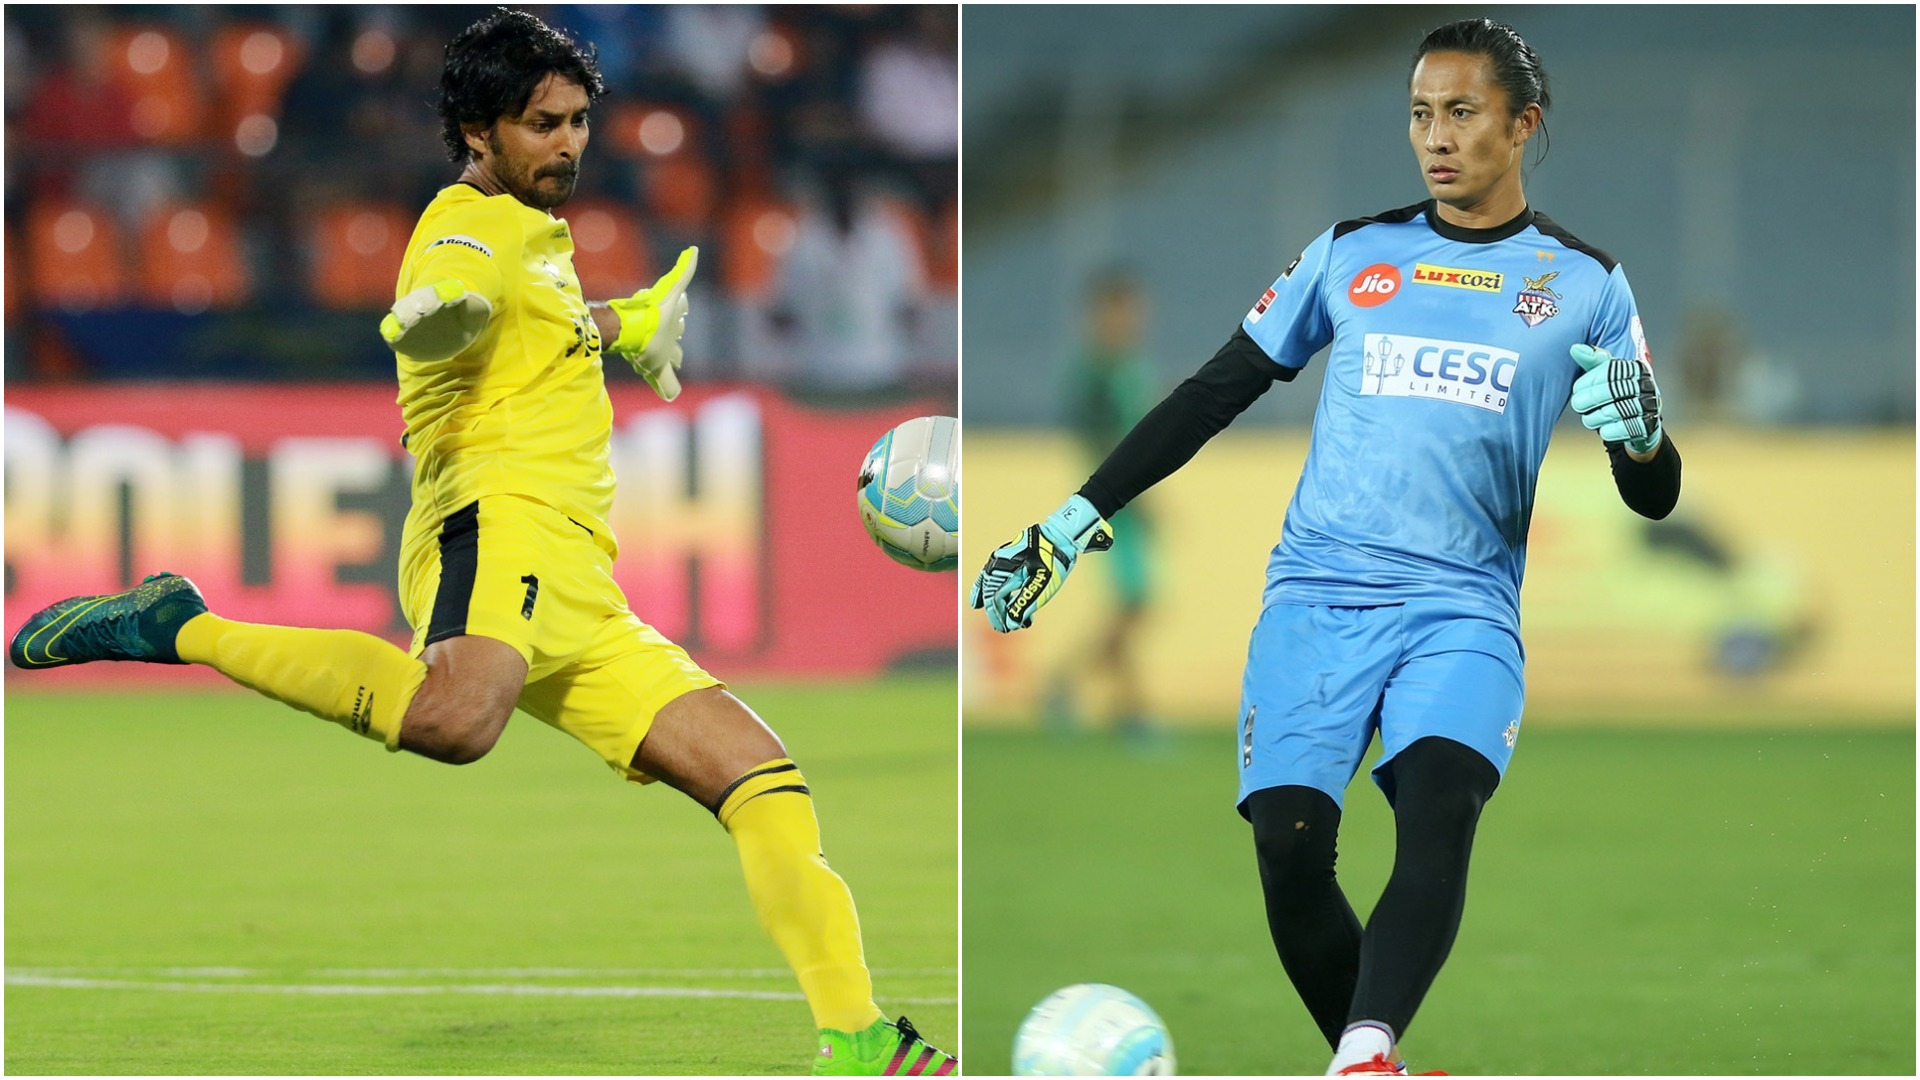 Northeast United FC sign goalkeepers Subhasish Roy Chowdhury and Soram Anganba